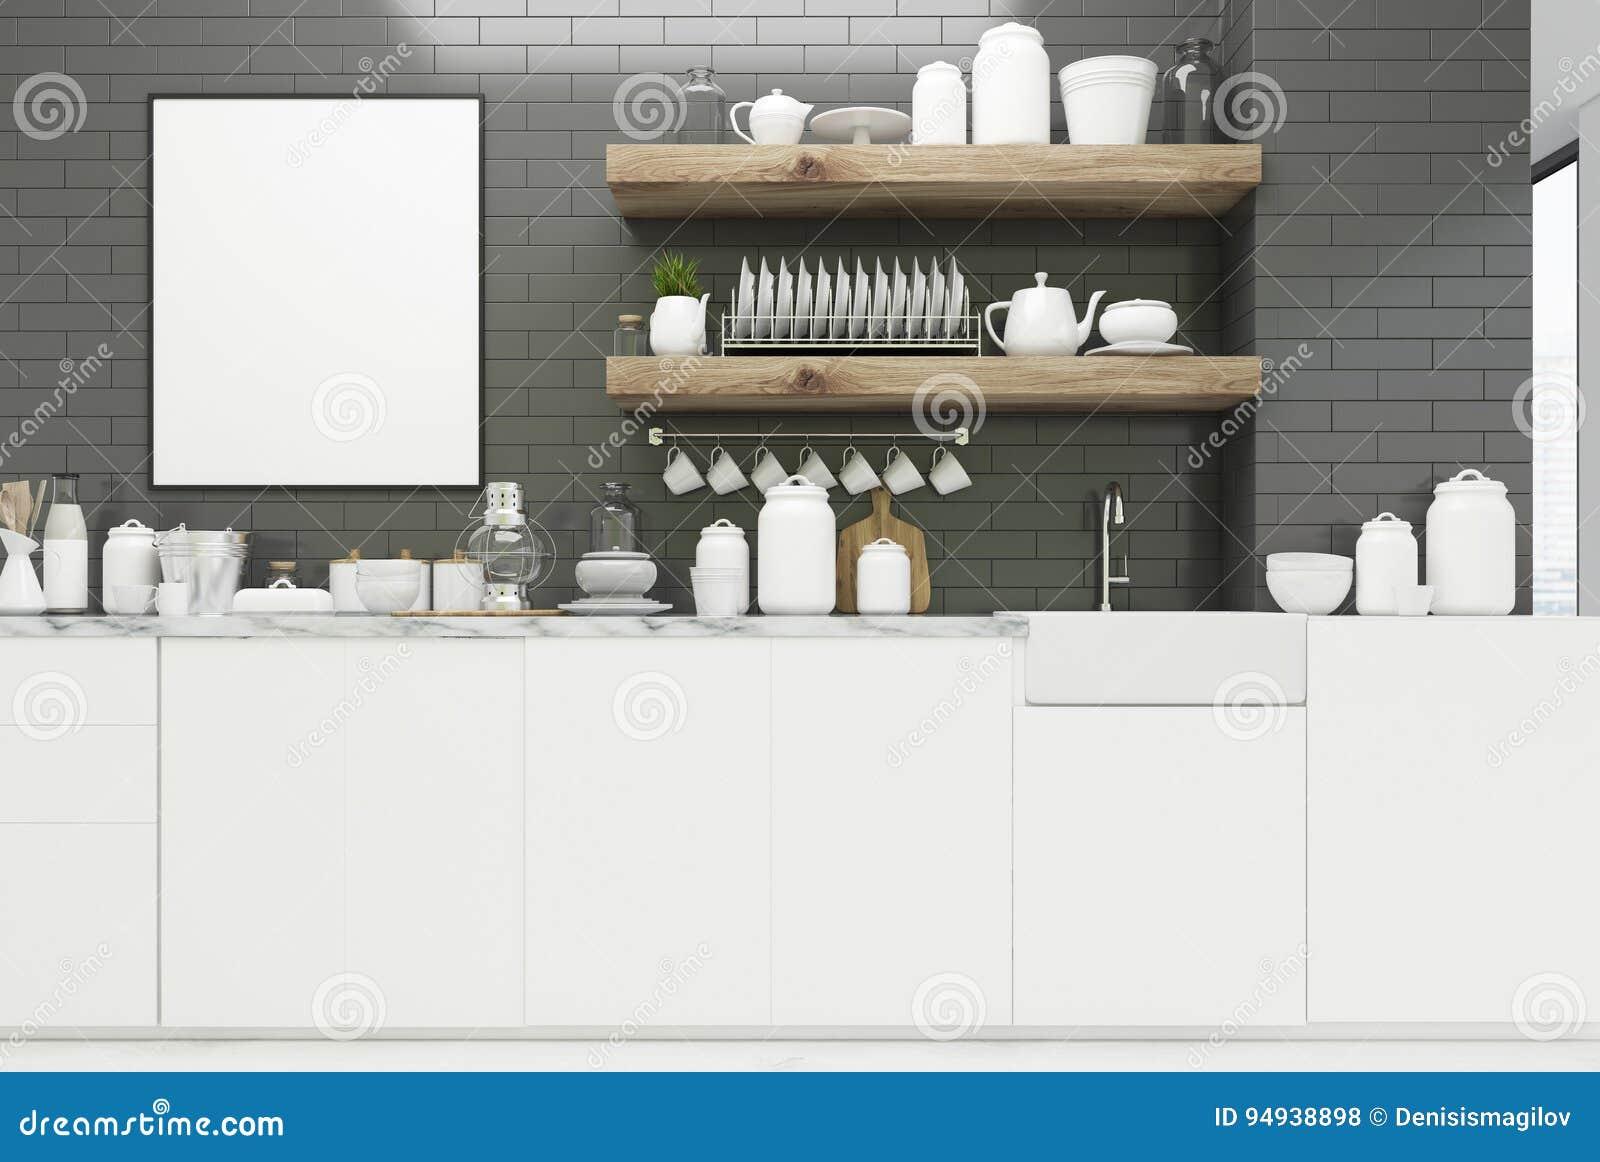 Gray Kitchen With Poster, Shelves Stock Illustration - Illustration ...